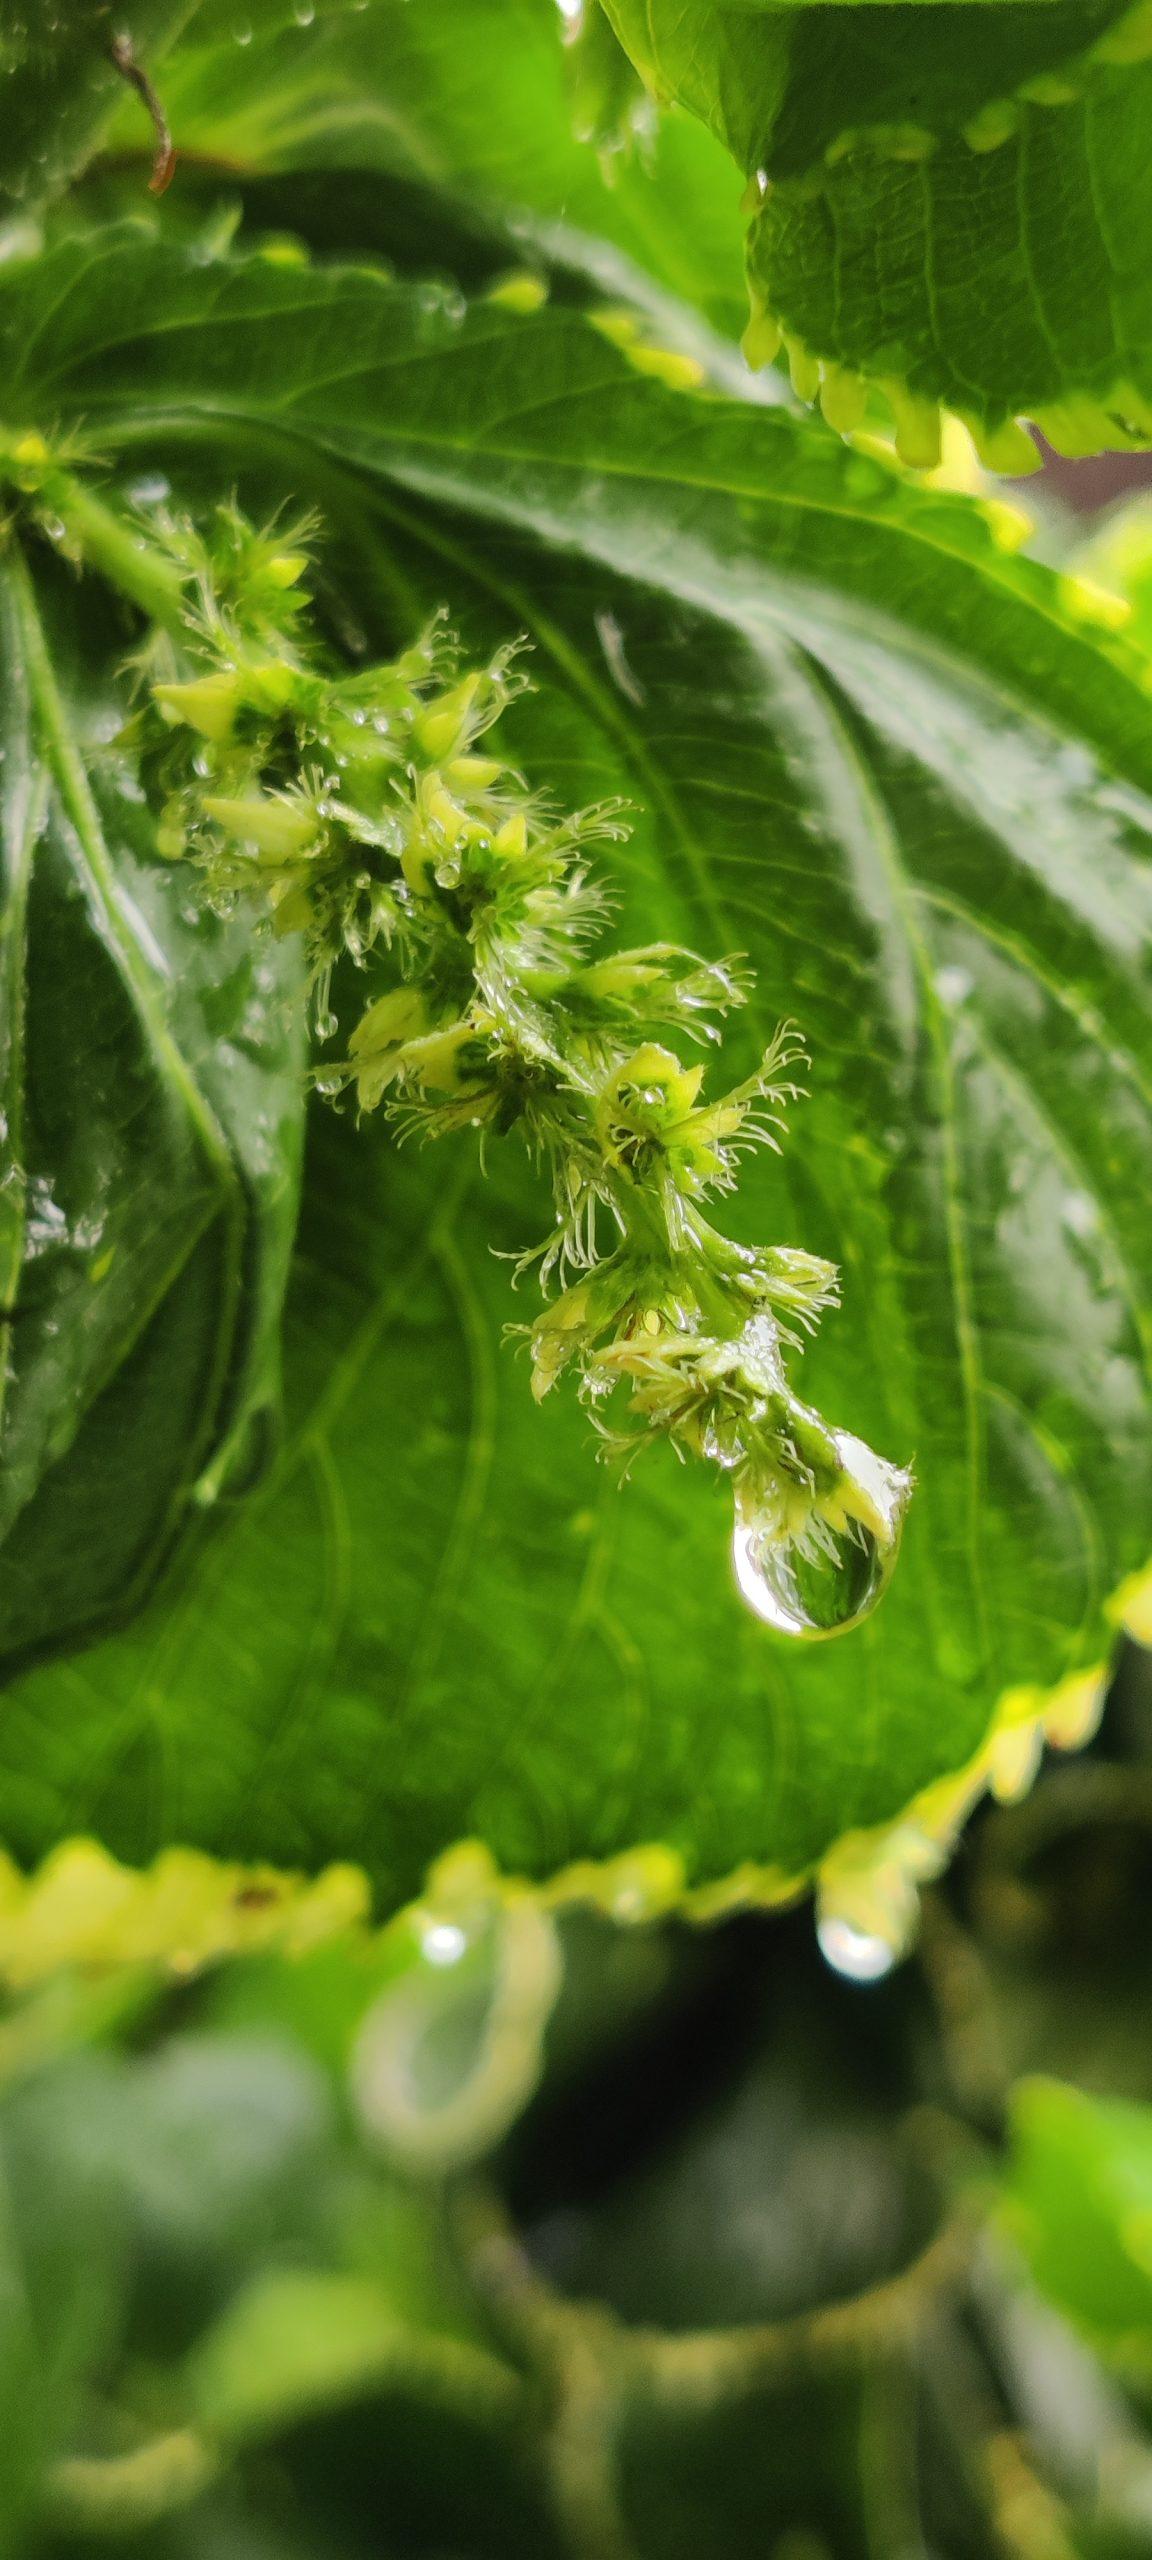 Water drop on a plant leaf